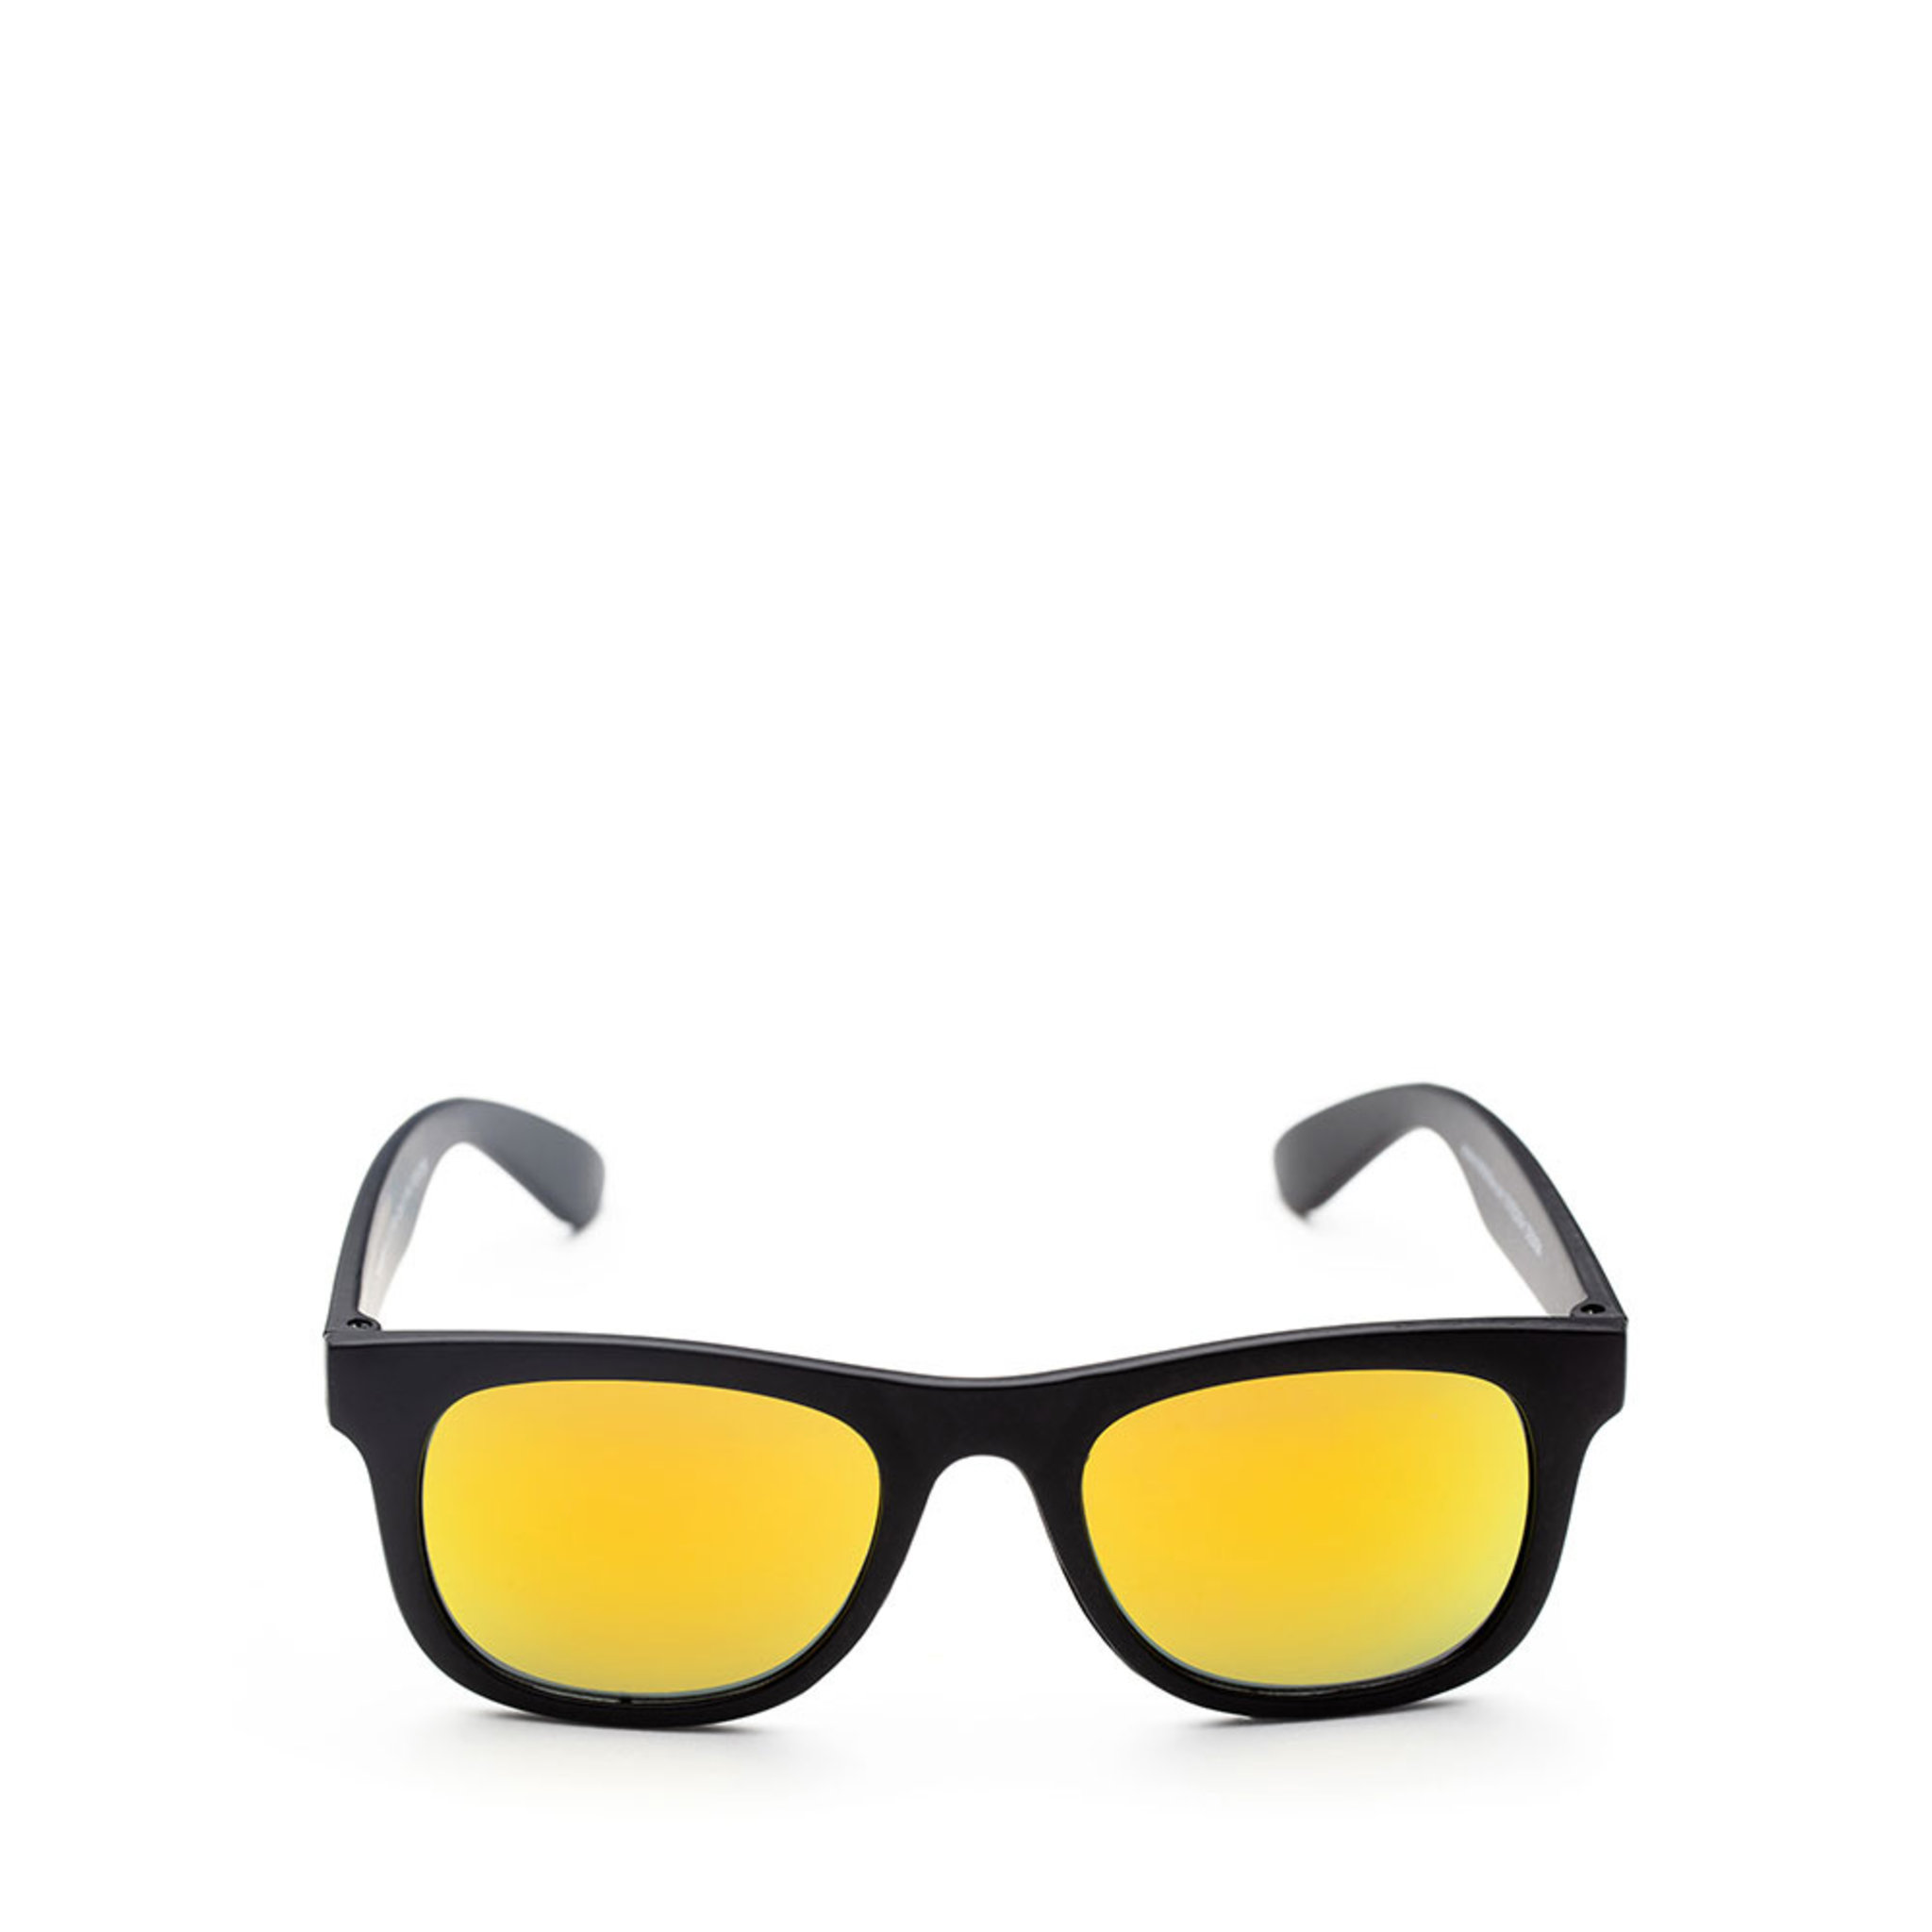 Kit barnsolglasögon